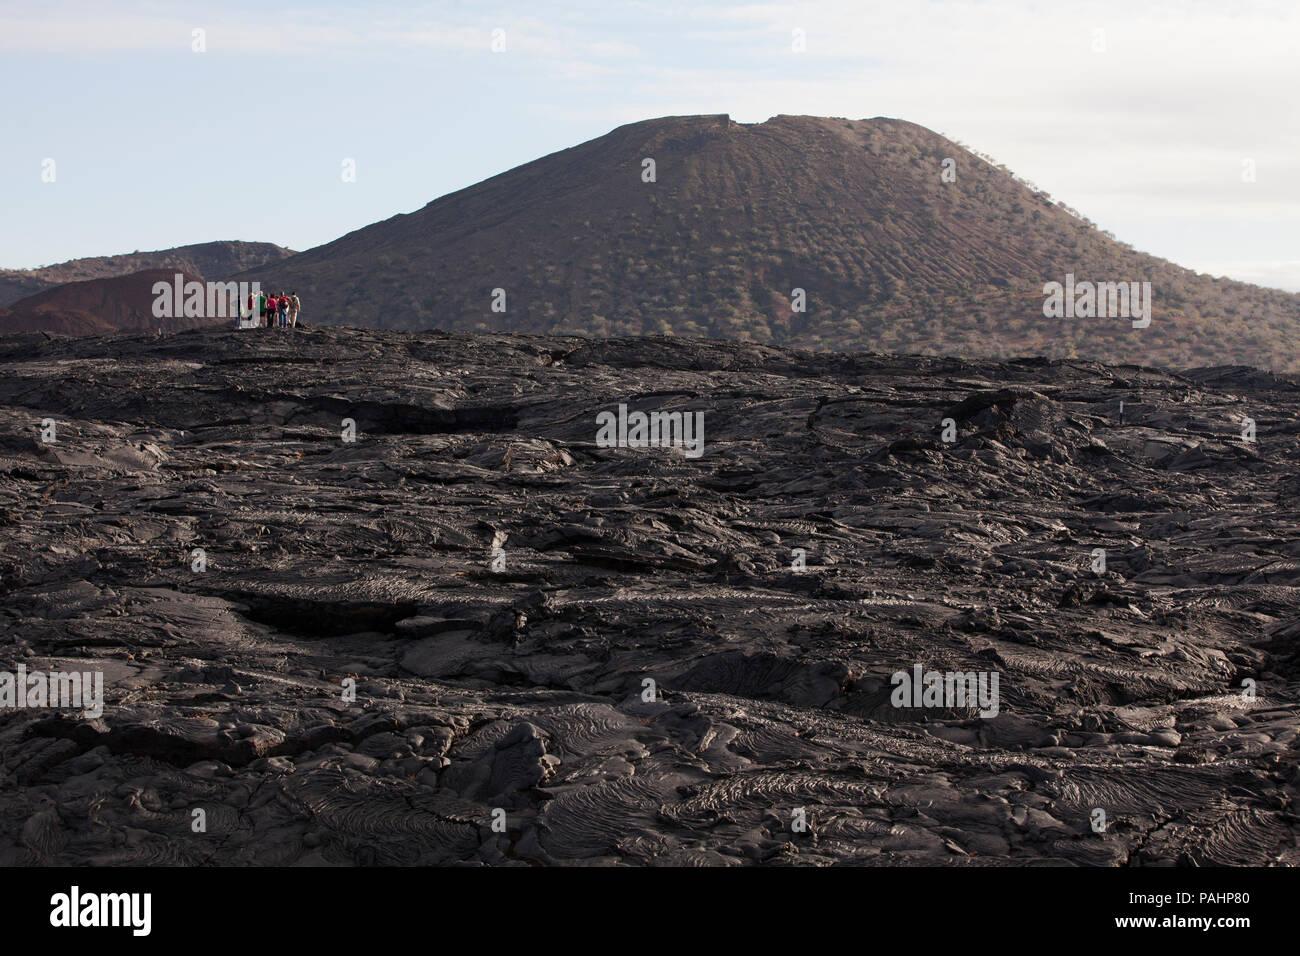 Volcanic Landscape of Lava, Santiago Island, Galapagos Islands Stock Photo